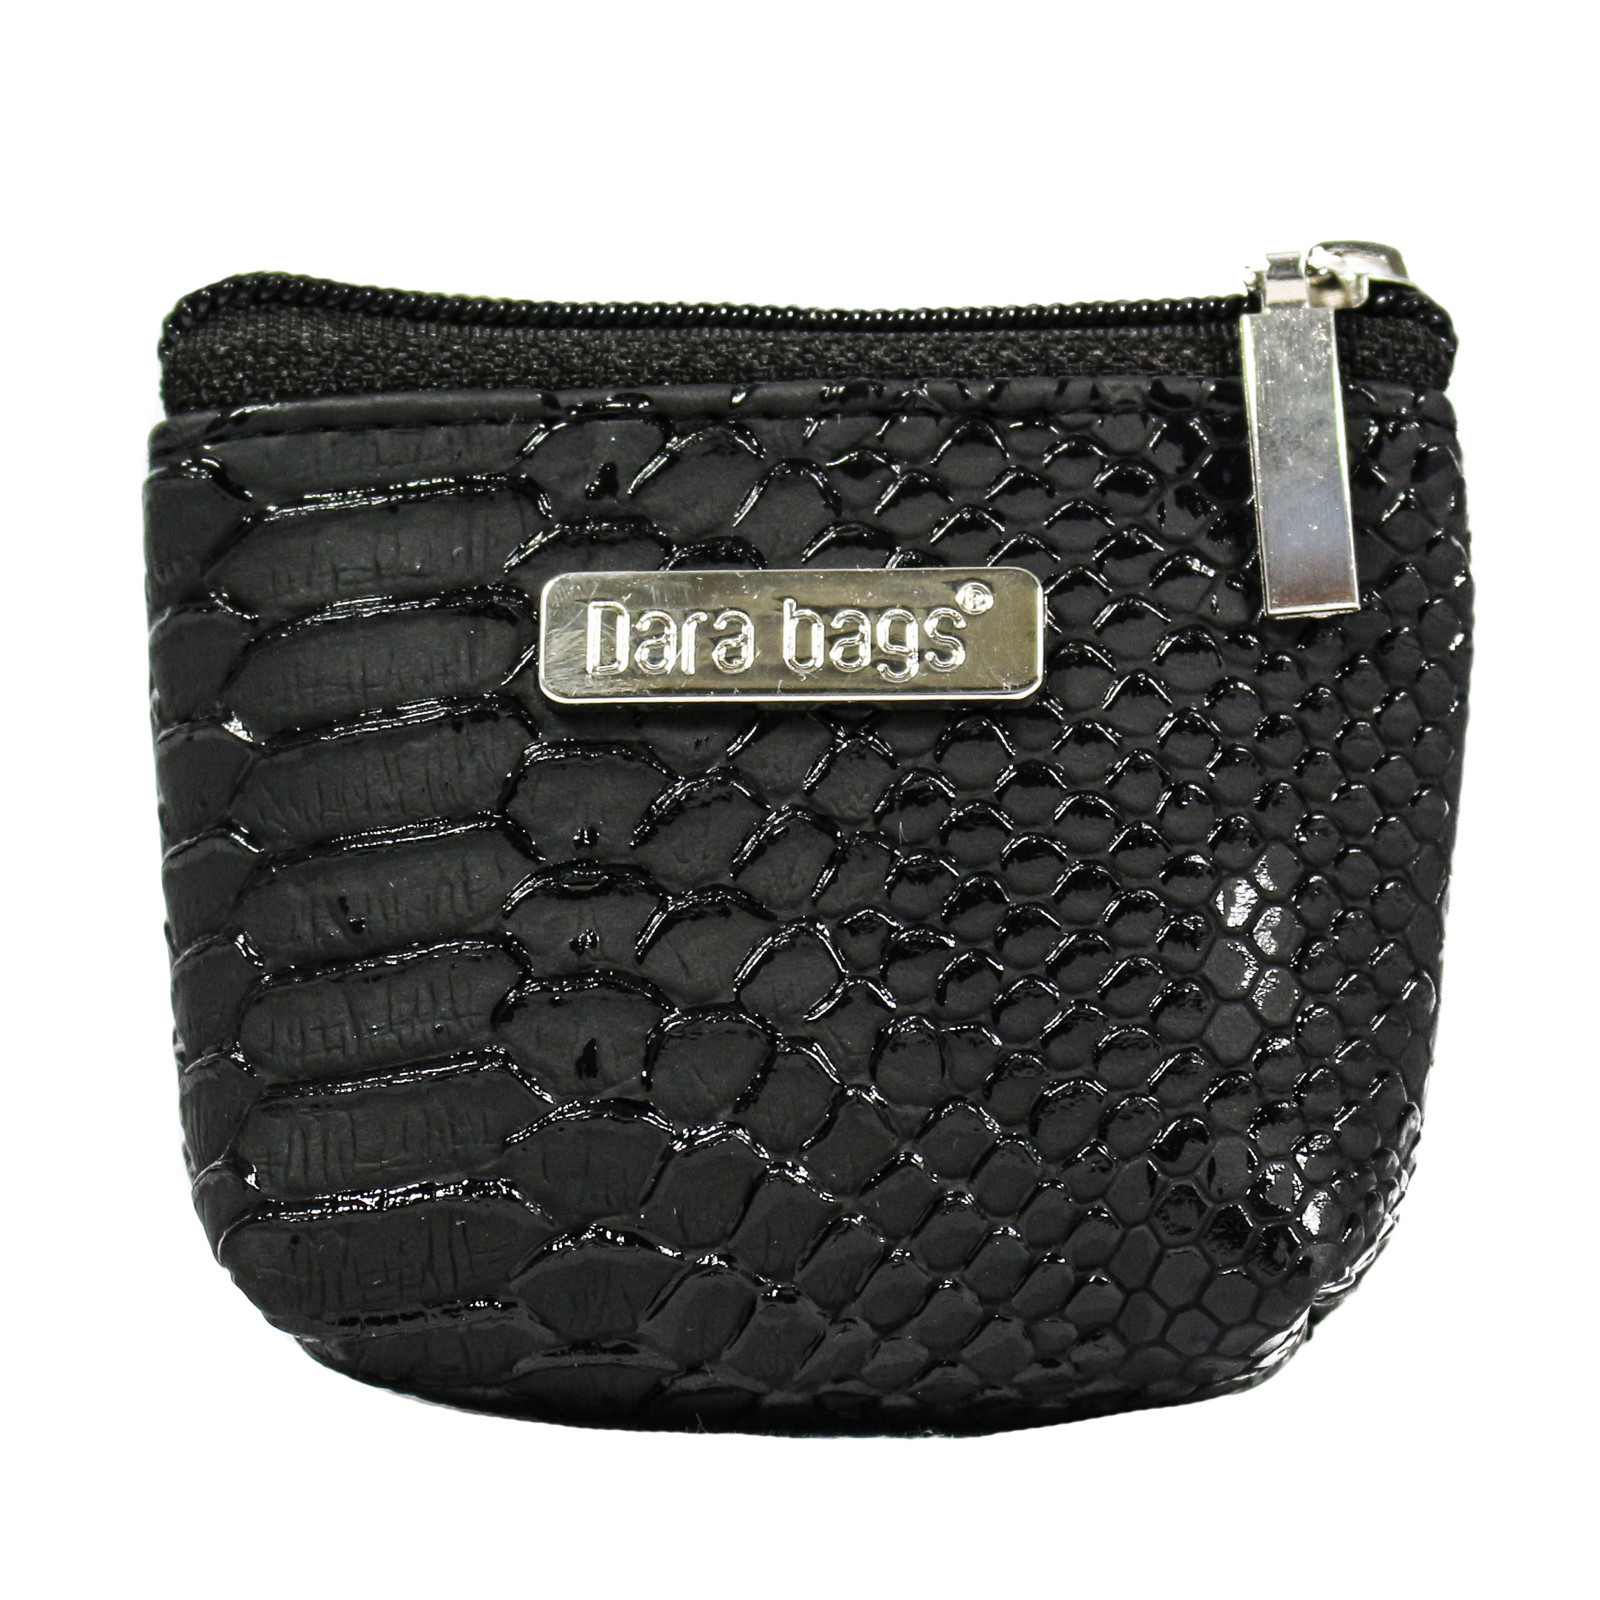 5e83ae4ec4 Baggie Mini no.374   Zboží prodejce Dara bags